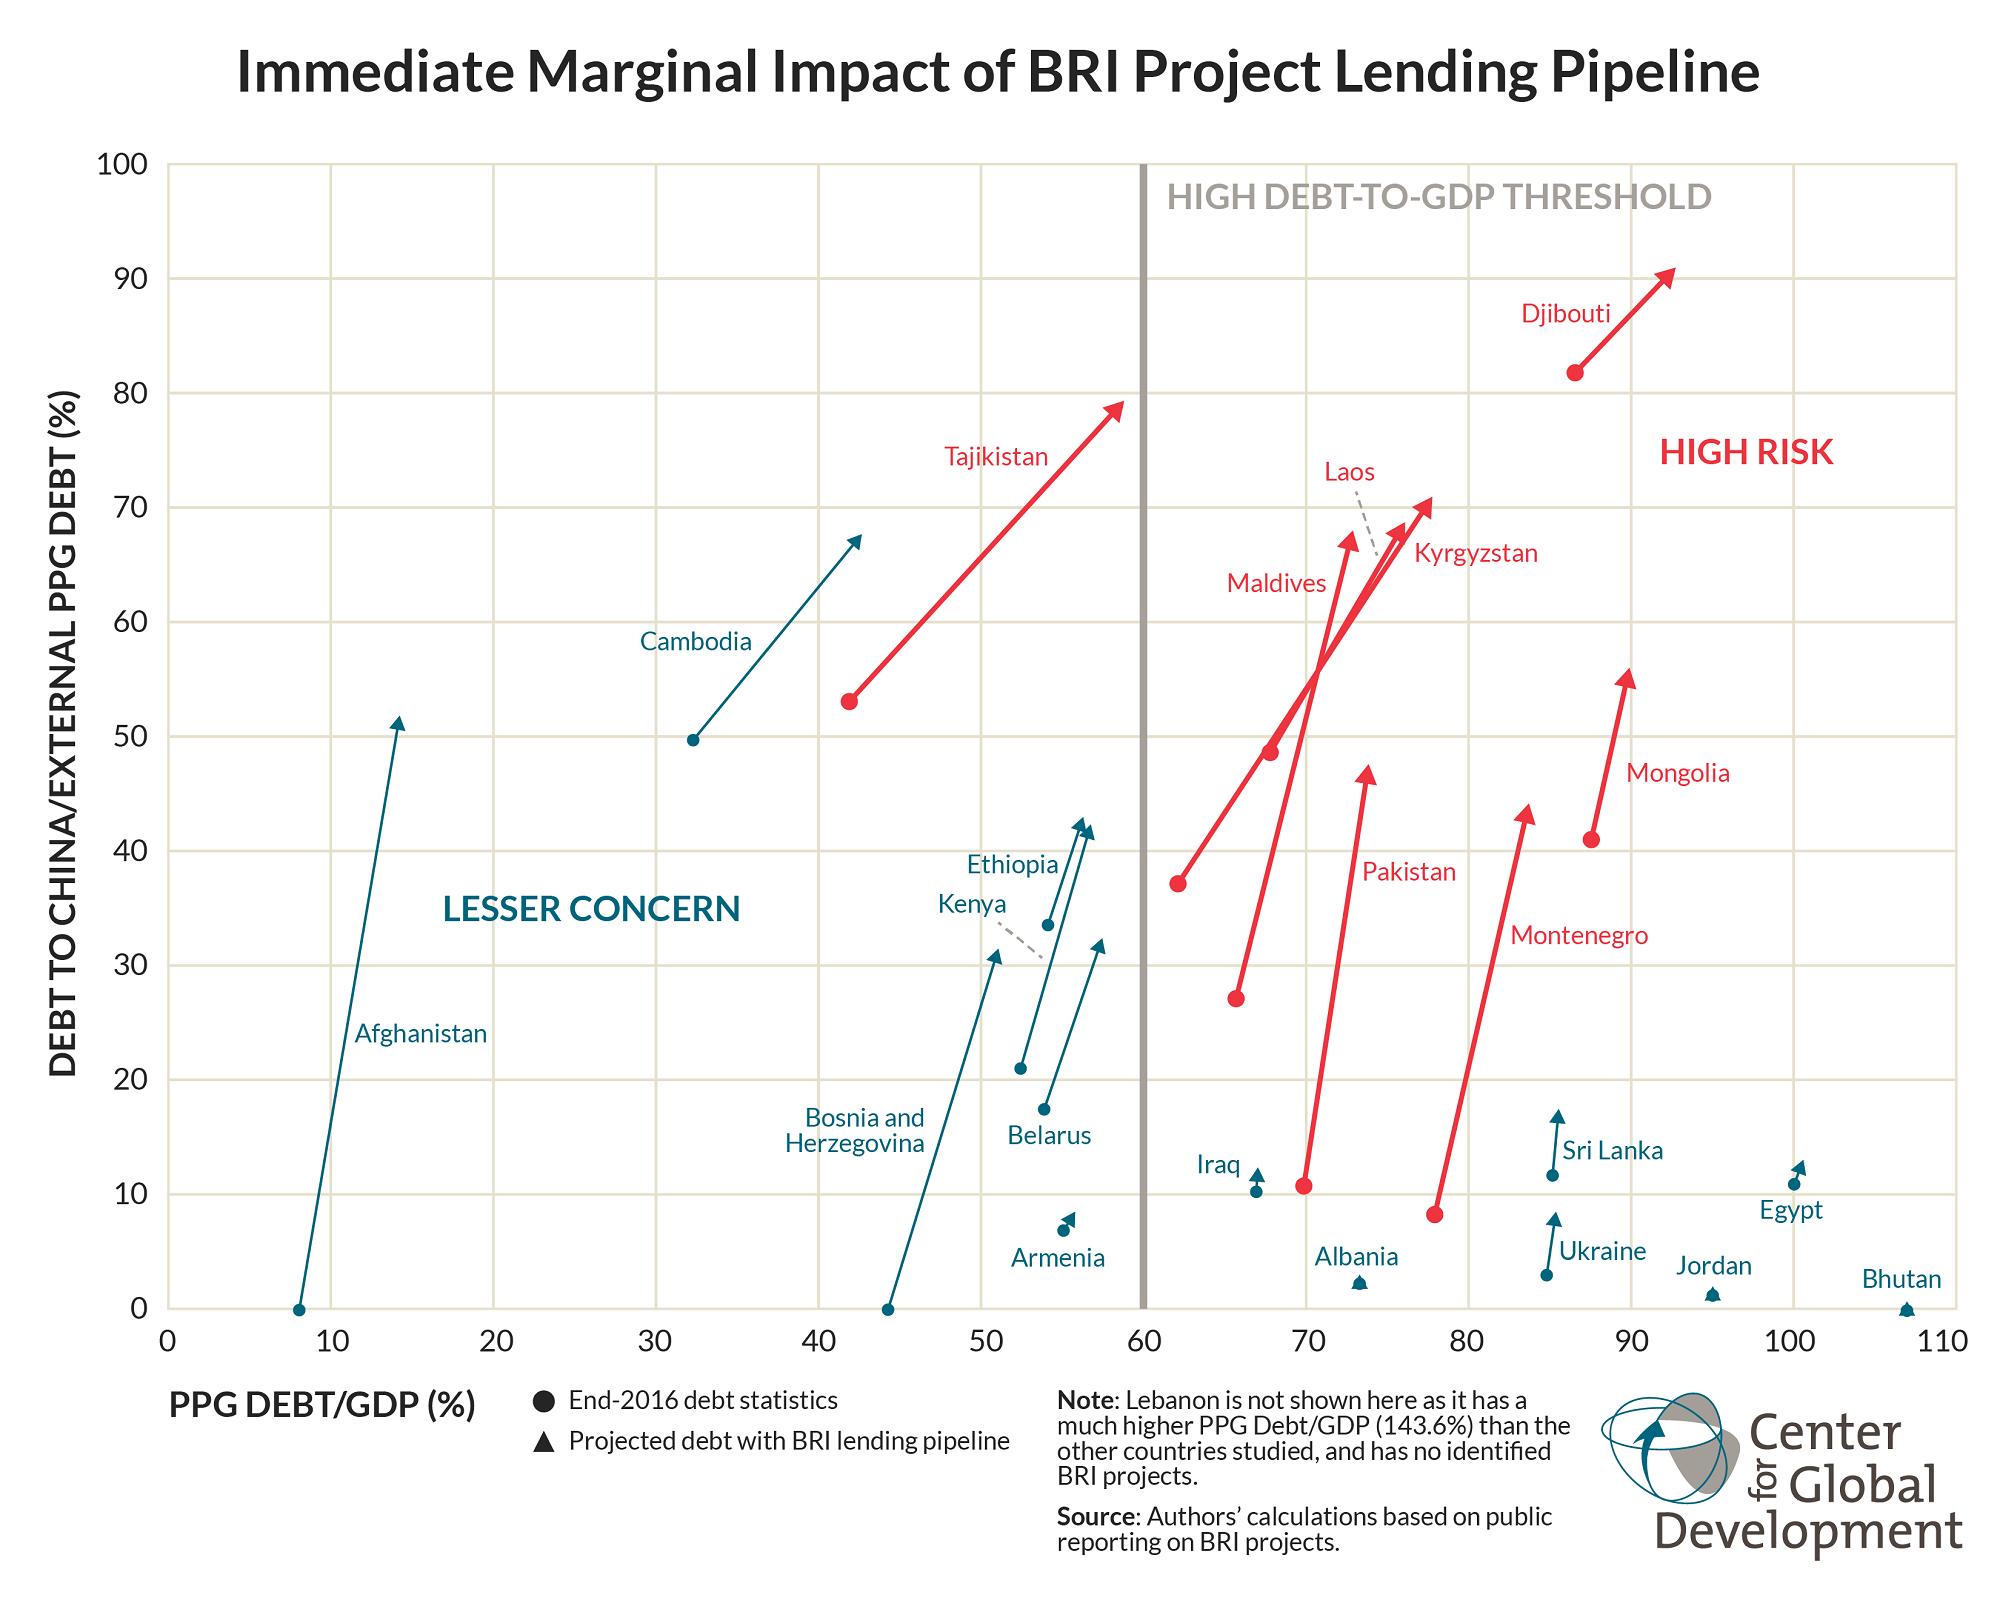 Immediate Marginal Impact of BRI Project Lending Pipeline